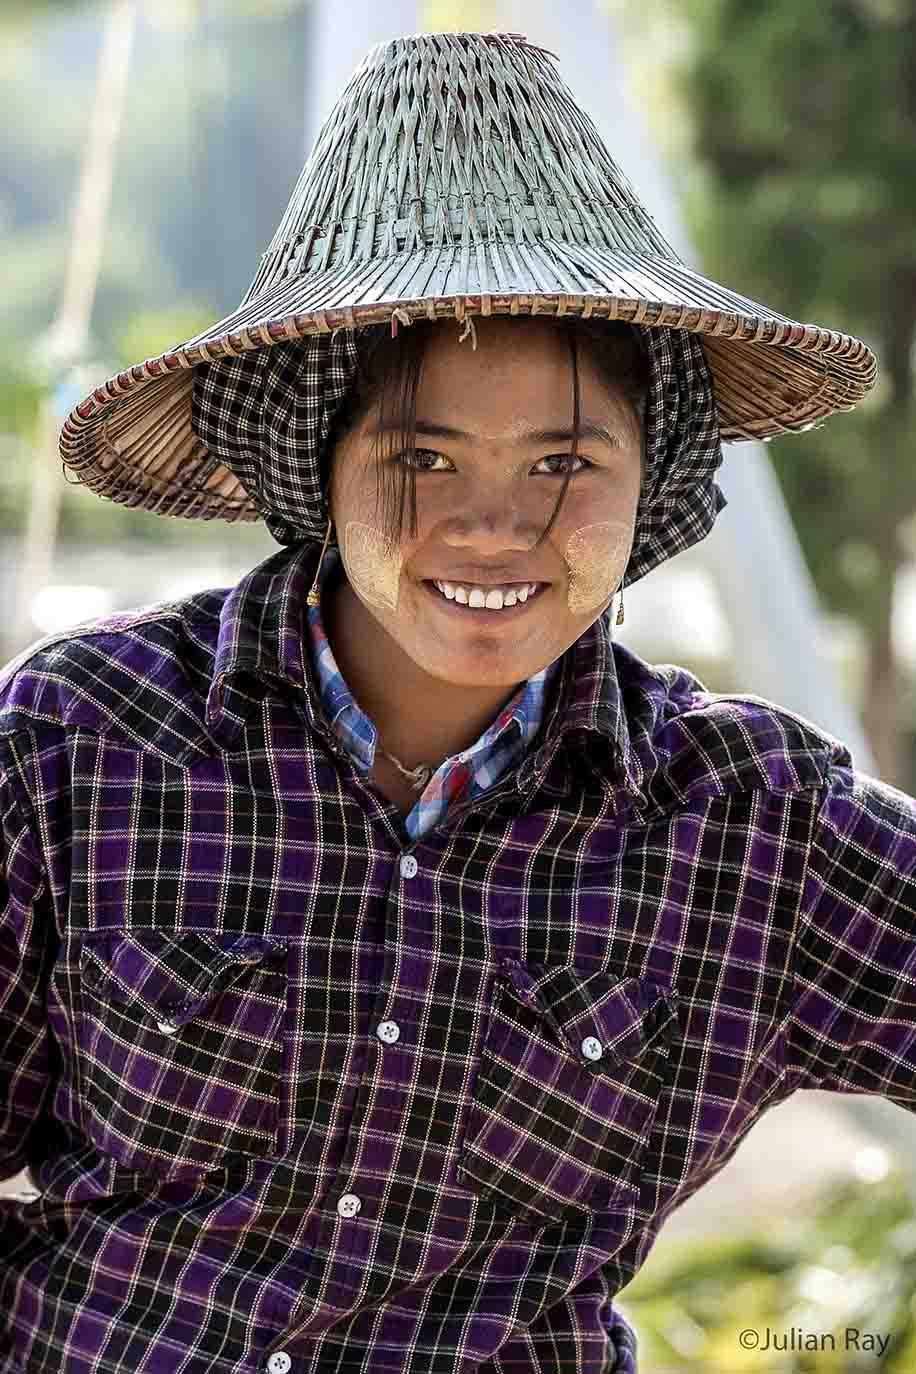 Tuesdayt in Nay Pyi Taw.